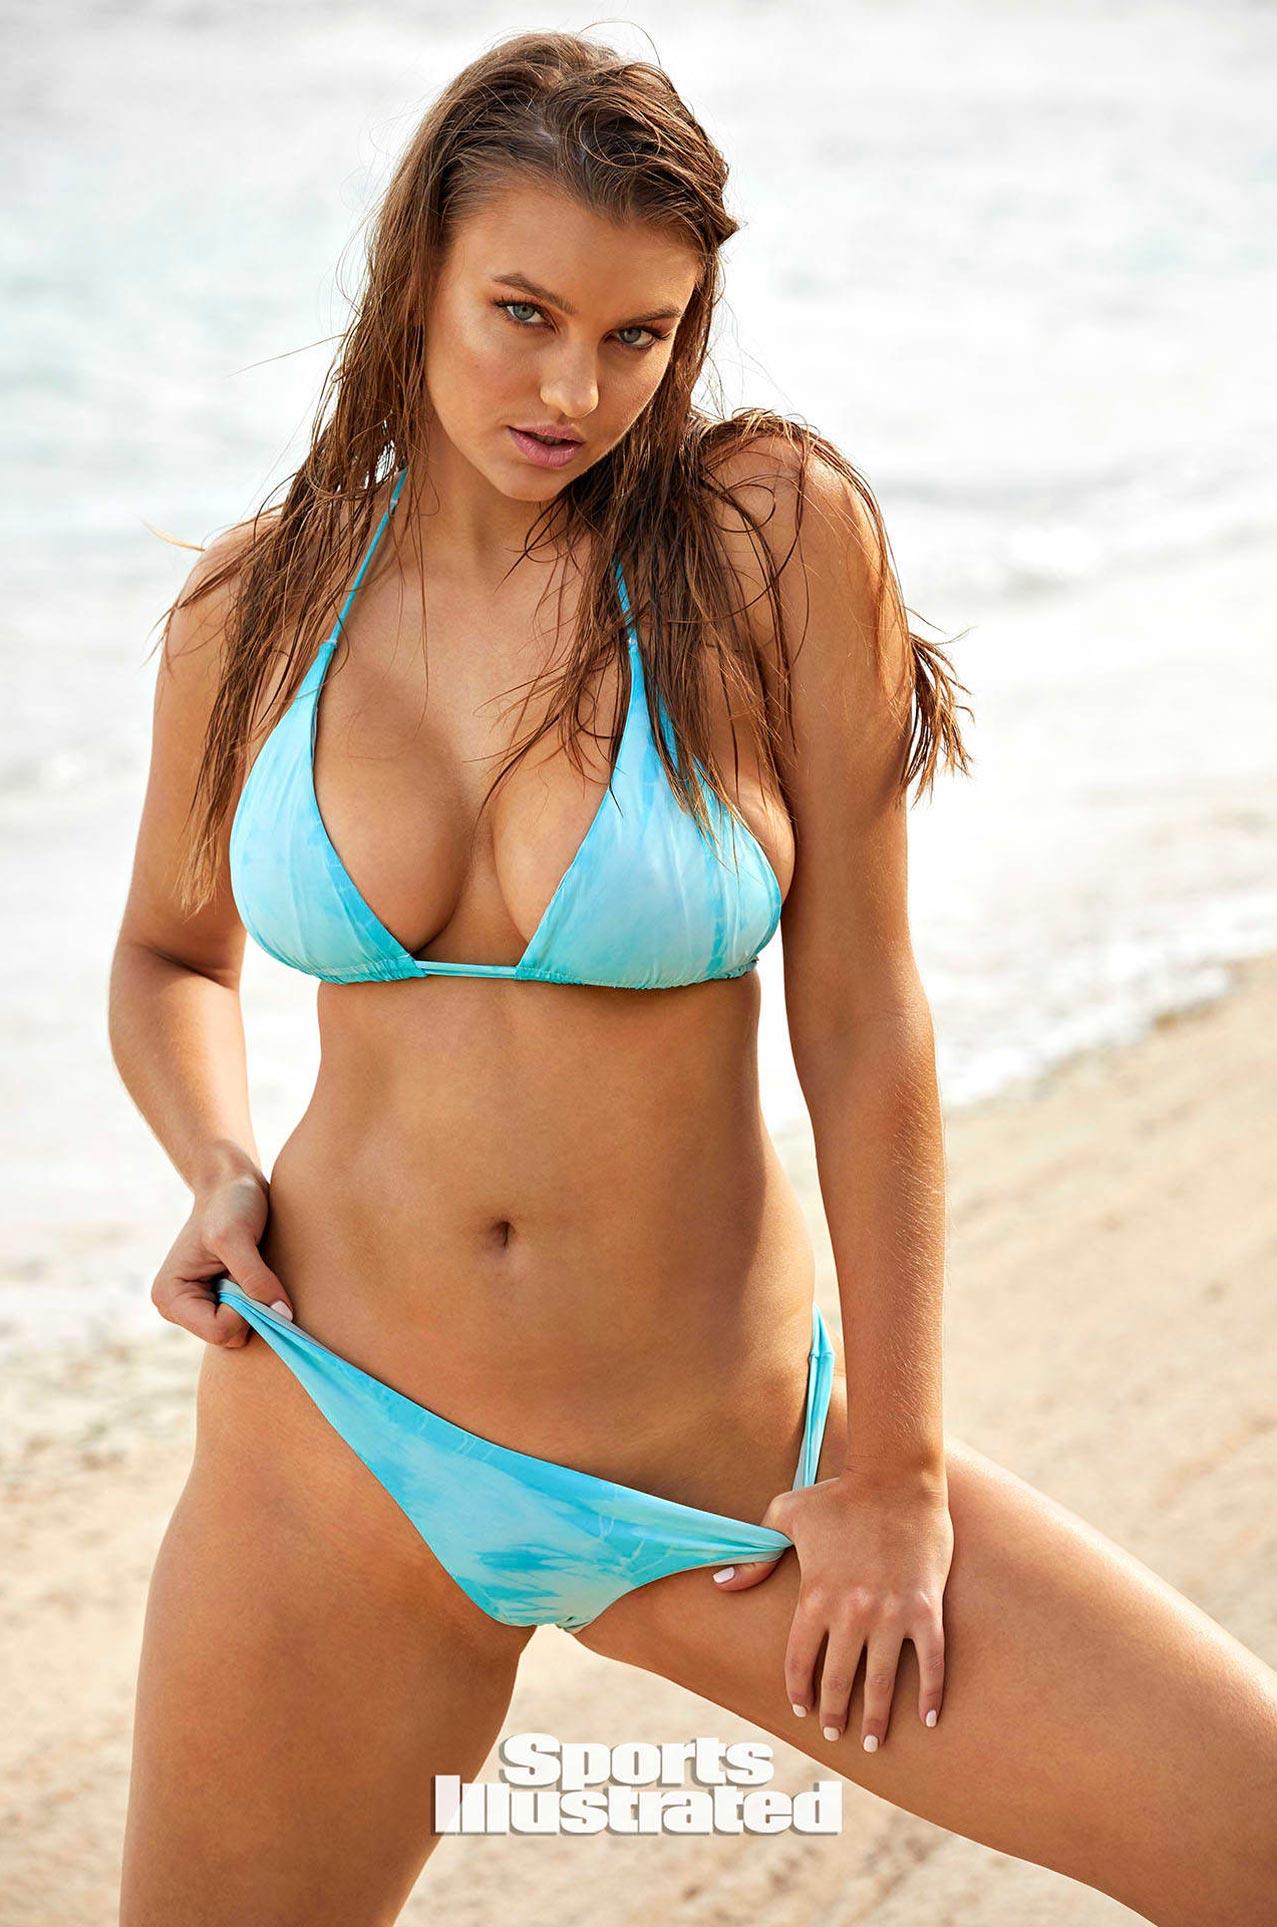 Оливия Брауэр в каталоге купальников Sports Illustrated Swimsuit 2020 / фото 06